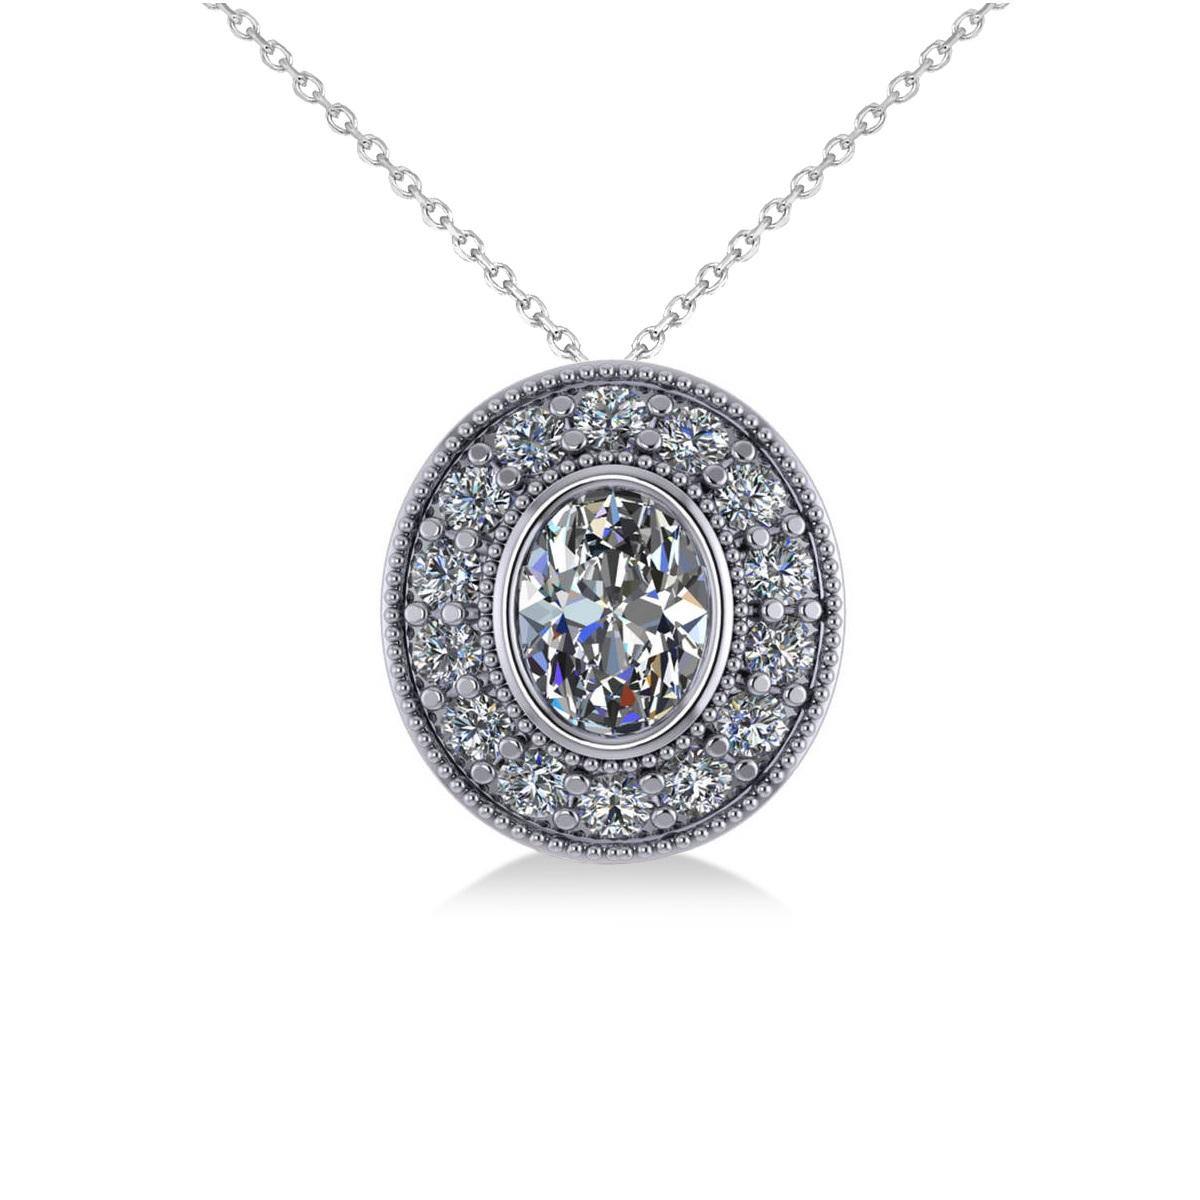 Diamond Halo Oval Pendant Necklace 14k White Gold (1.18ct)